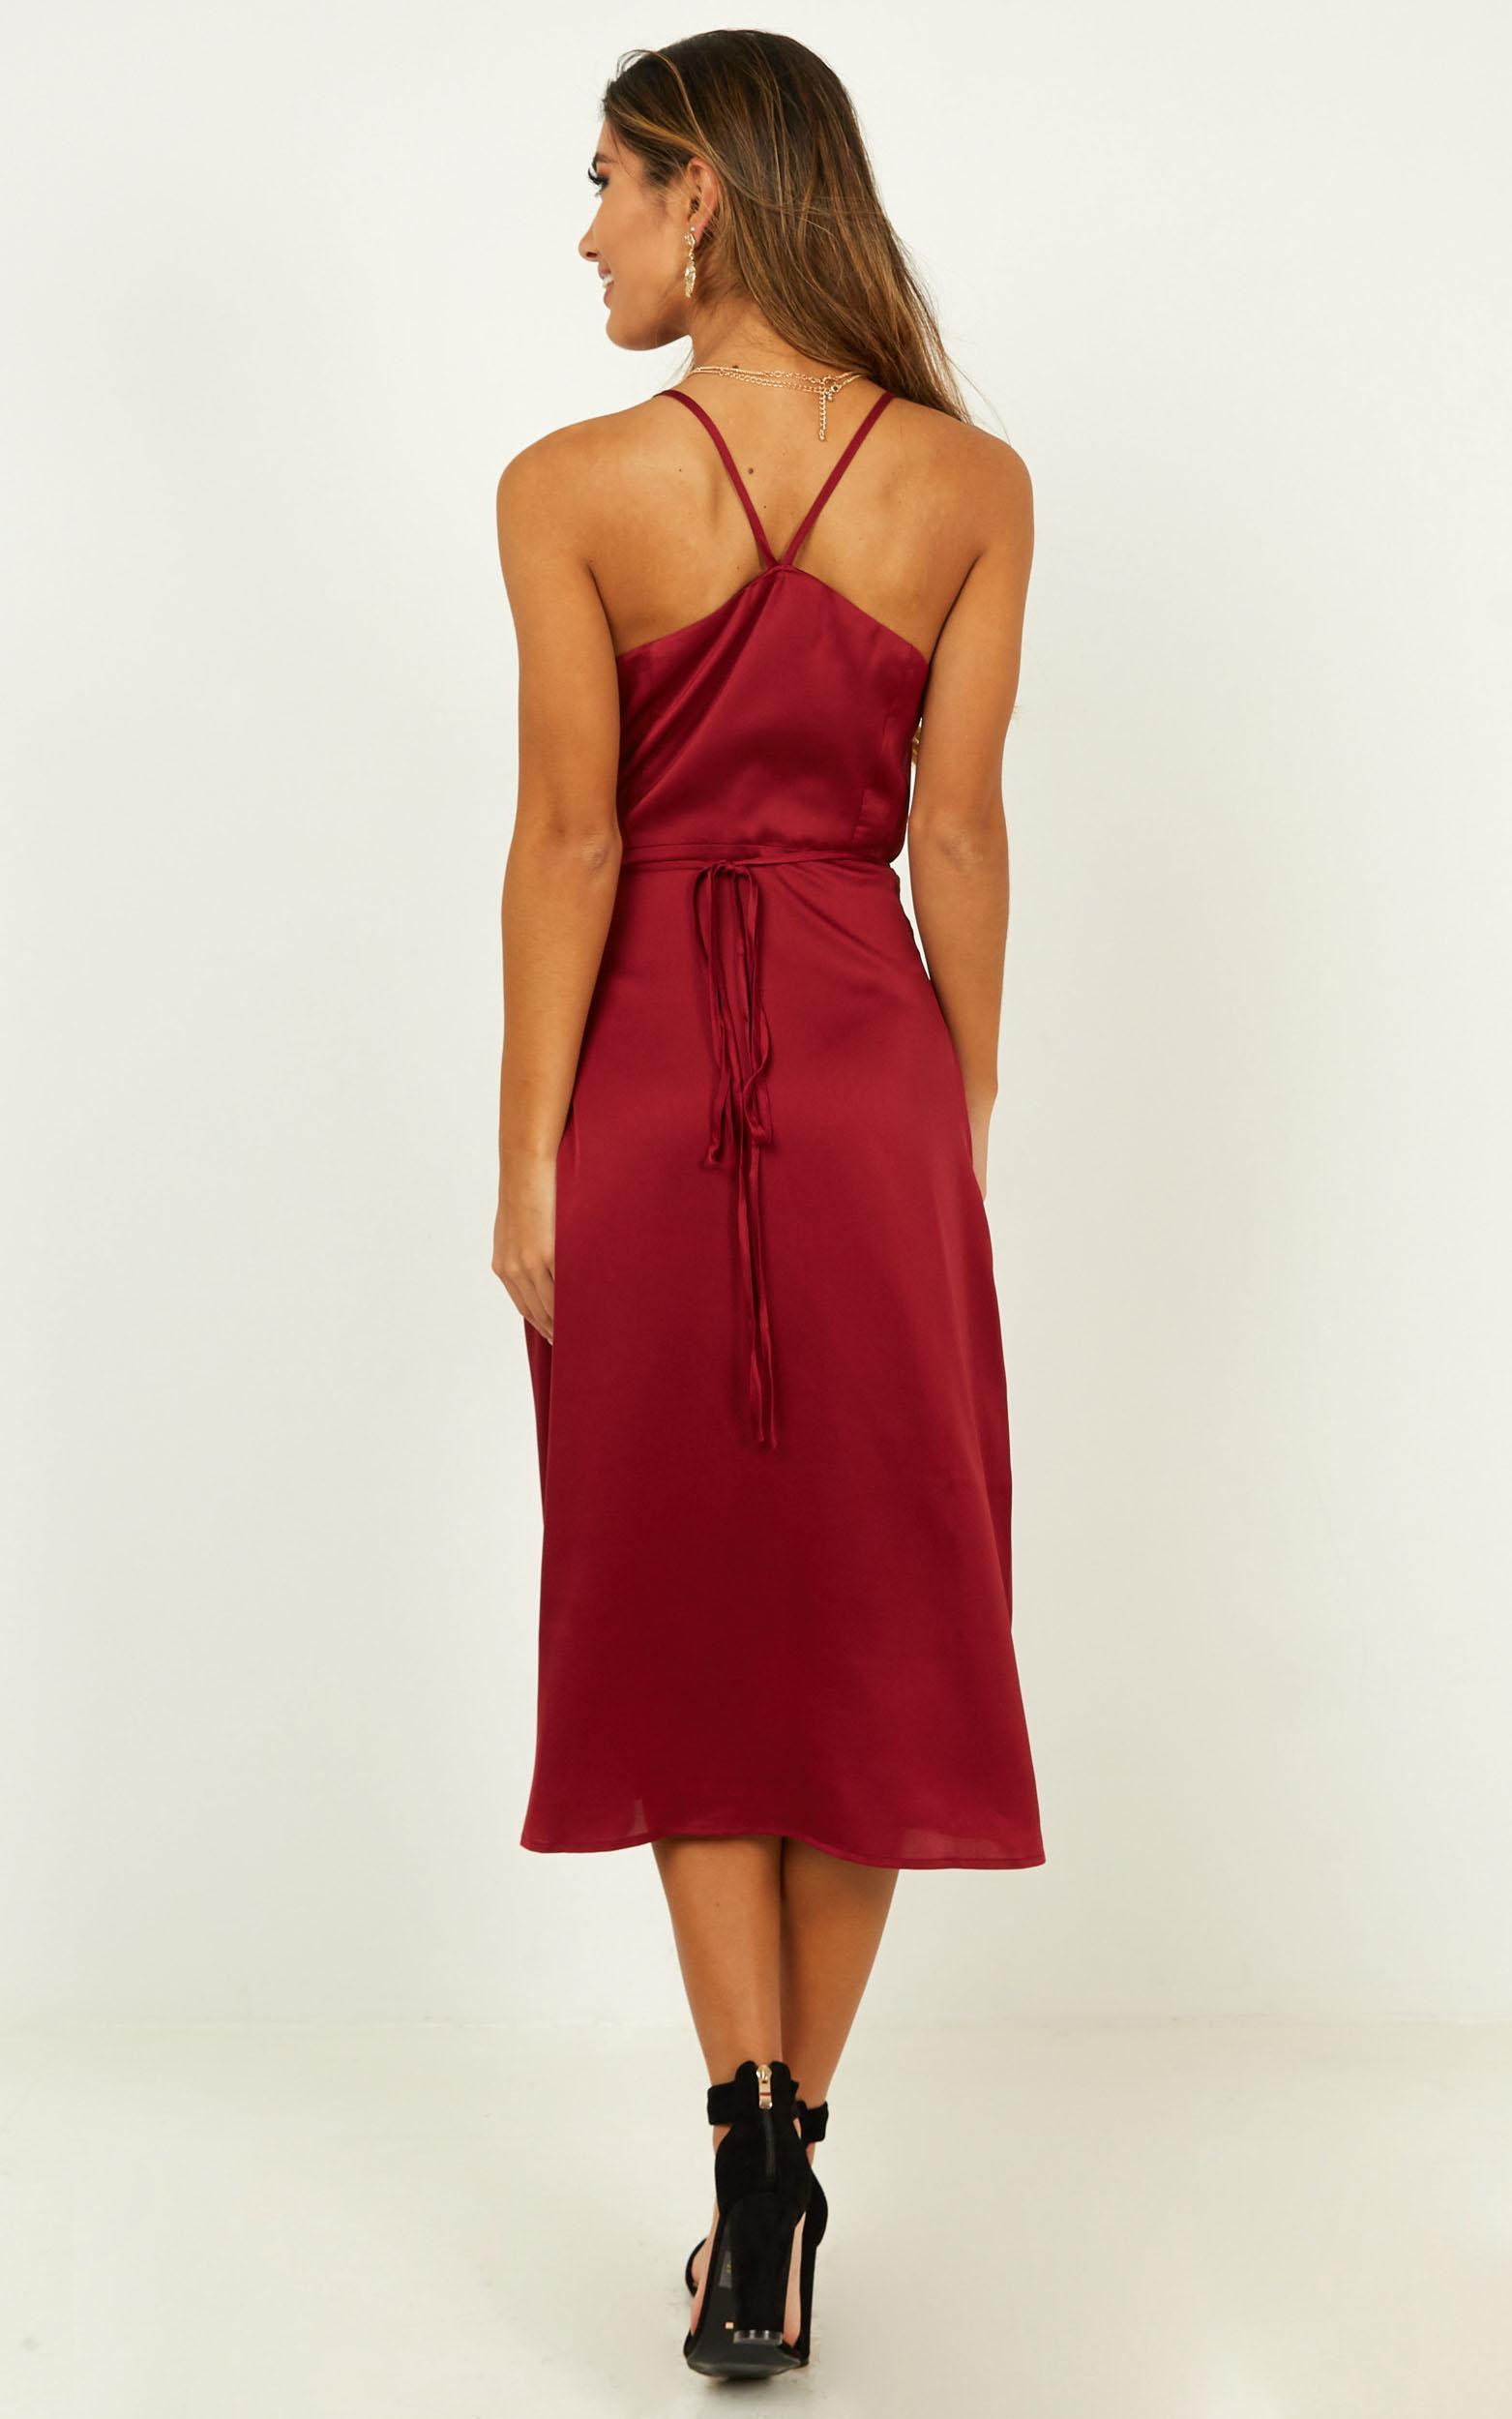 Heart Throbbing Dress in wine satin - 20 (XXXXL), Wine, hi-res image number null